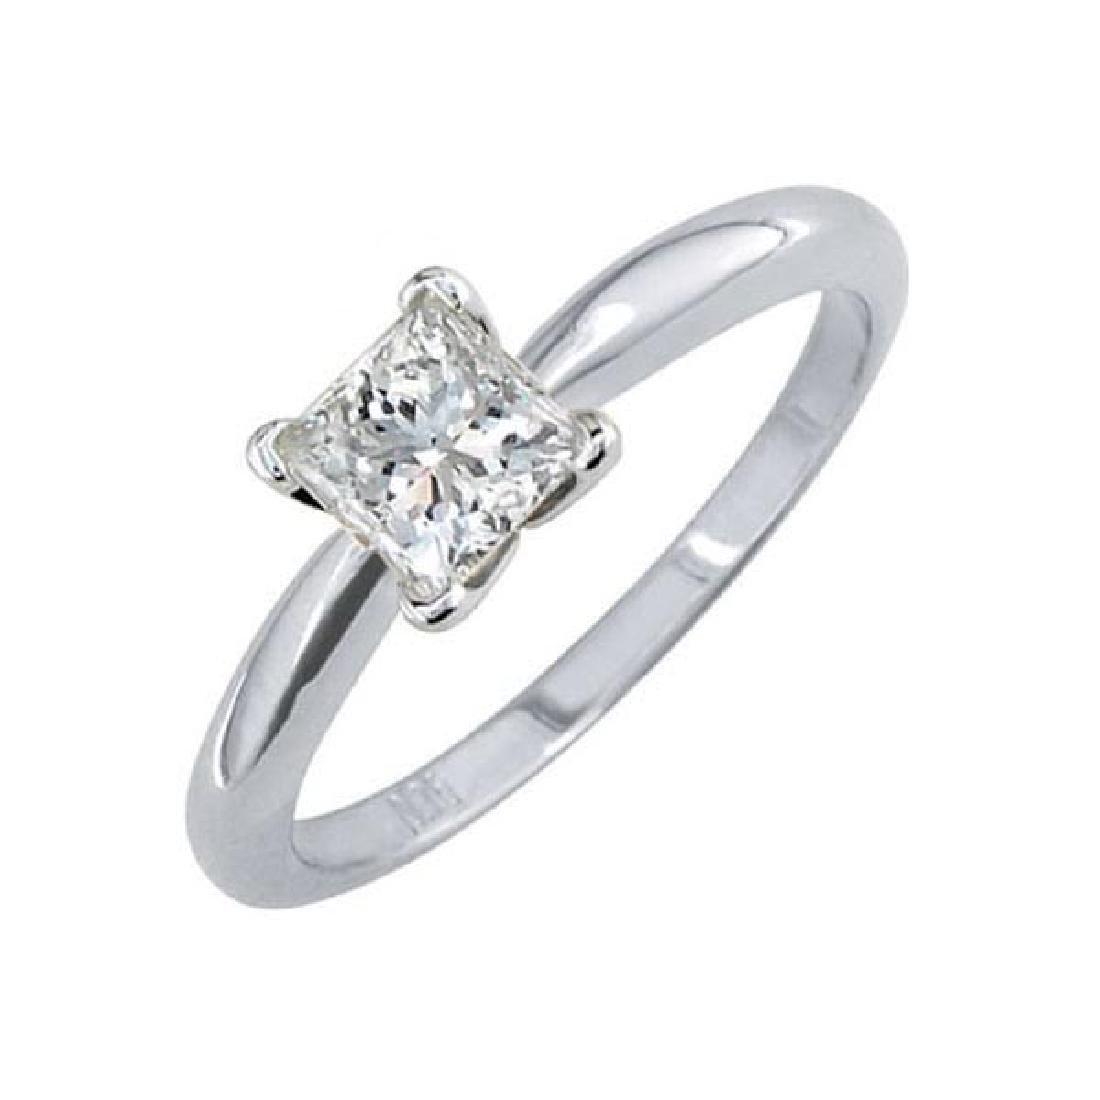 Certified 1.09 CTW Princess Diamond Solitaire 14k Ring